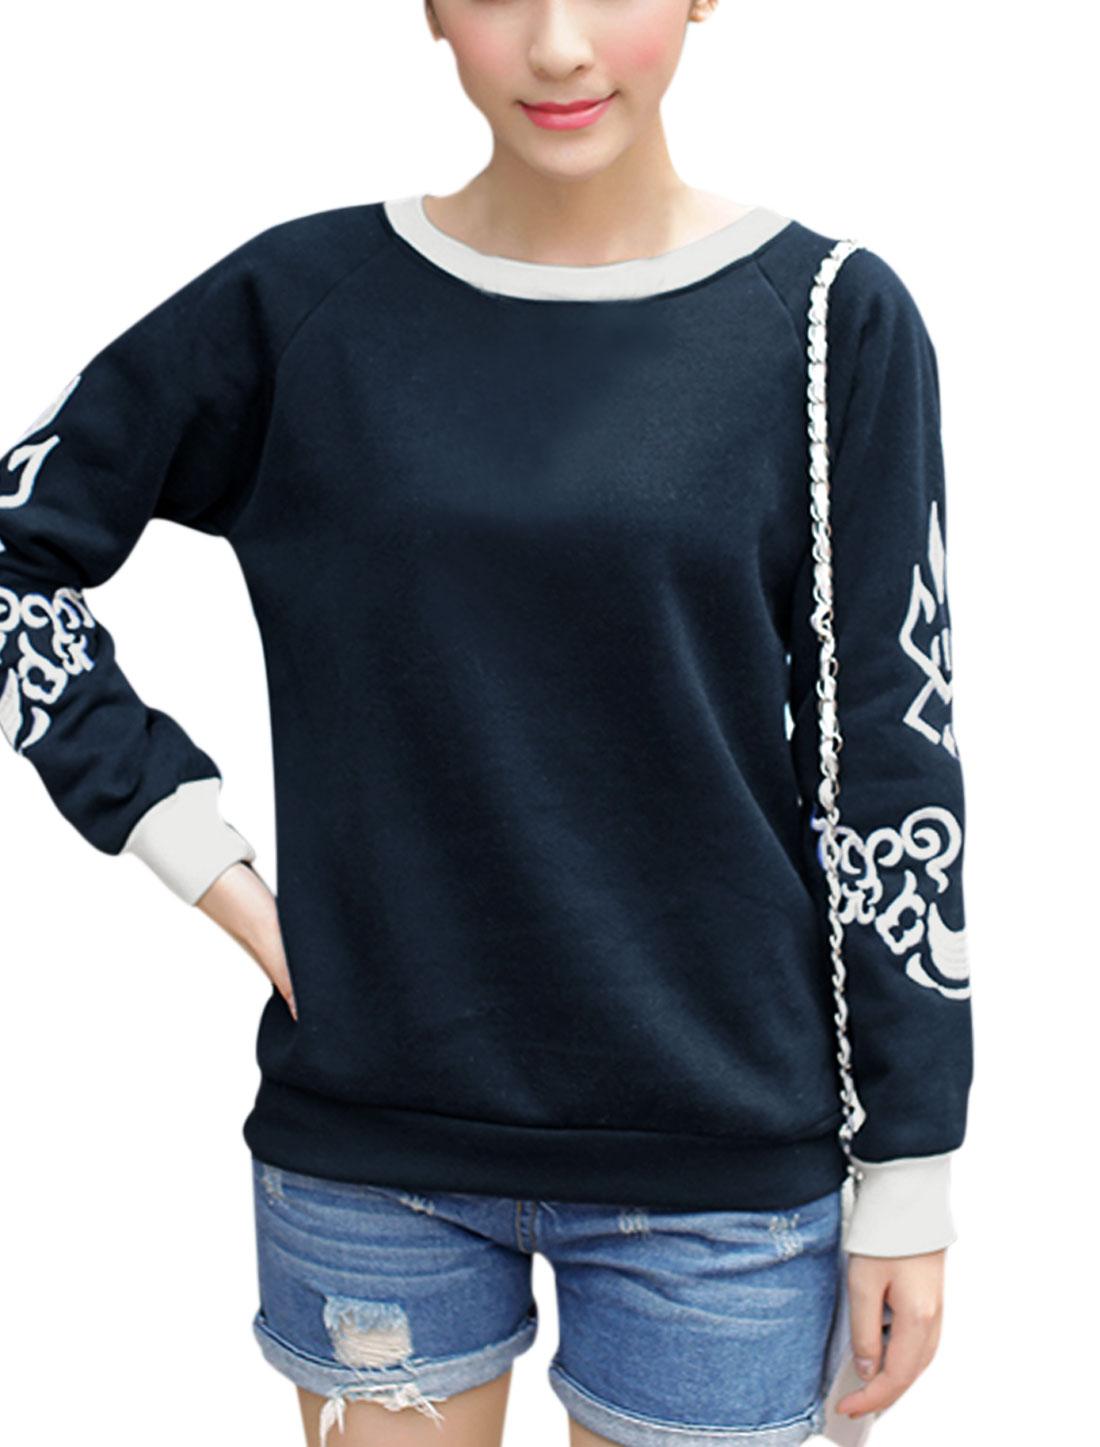 Ladies Crew Neck Pullover Leisure Sweatshirt Navy Blue XS